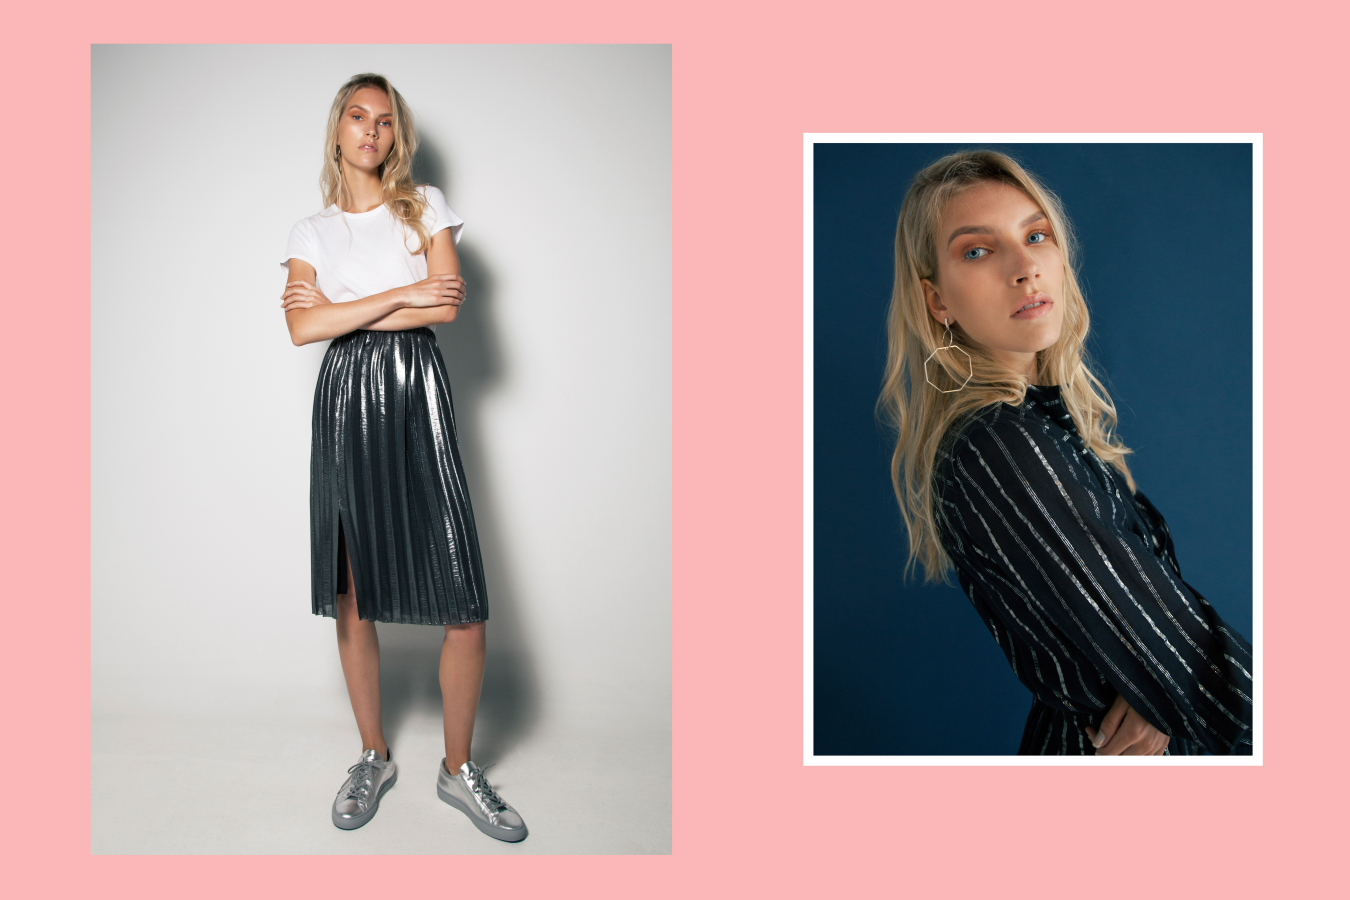 Left: Rag & Bone base tee, Isabel Marant Etoile Madlen silver skirt, Woman by Common Projects silver Achilles low sneaker - Right: Natasha Schweitzer Odette earrings, Isabel Marant Salome dress